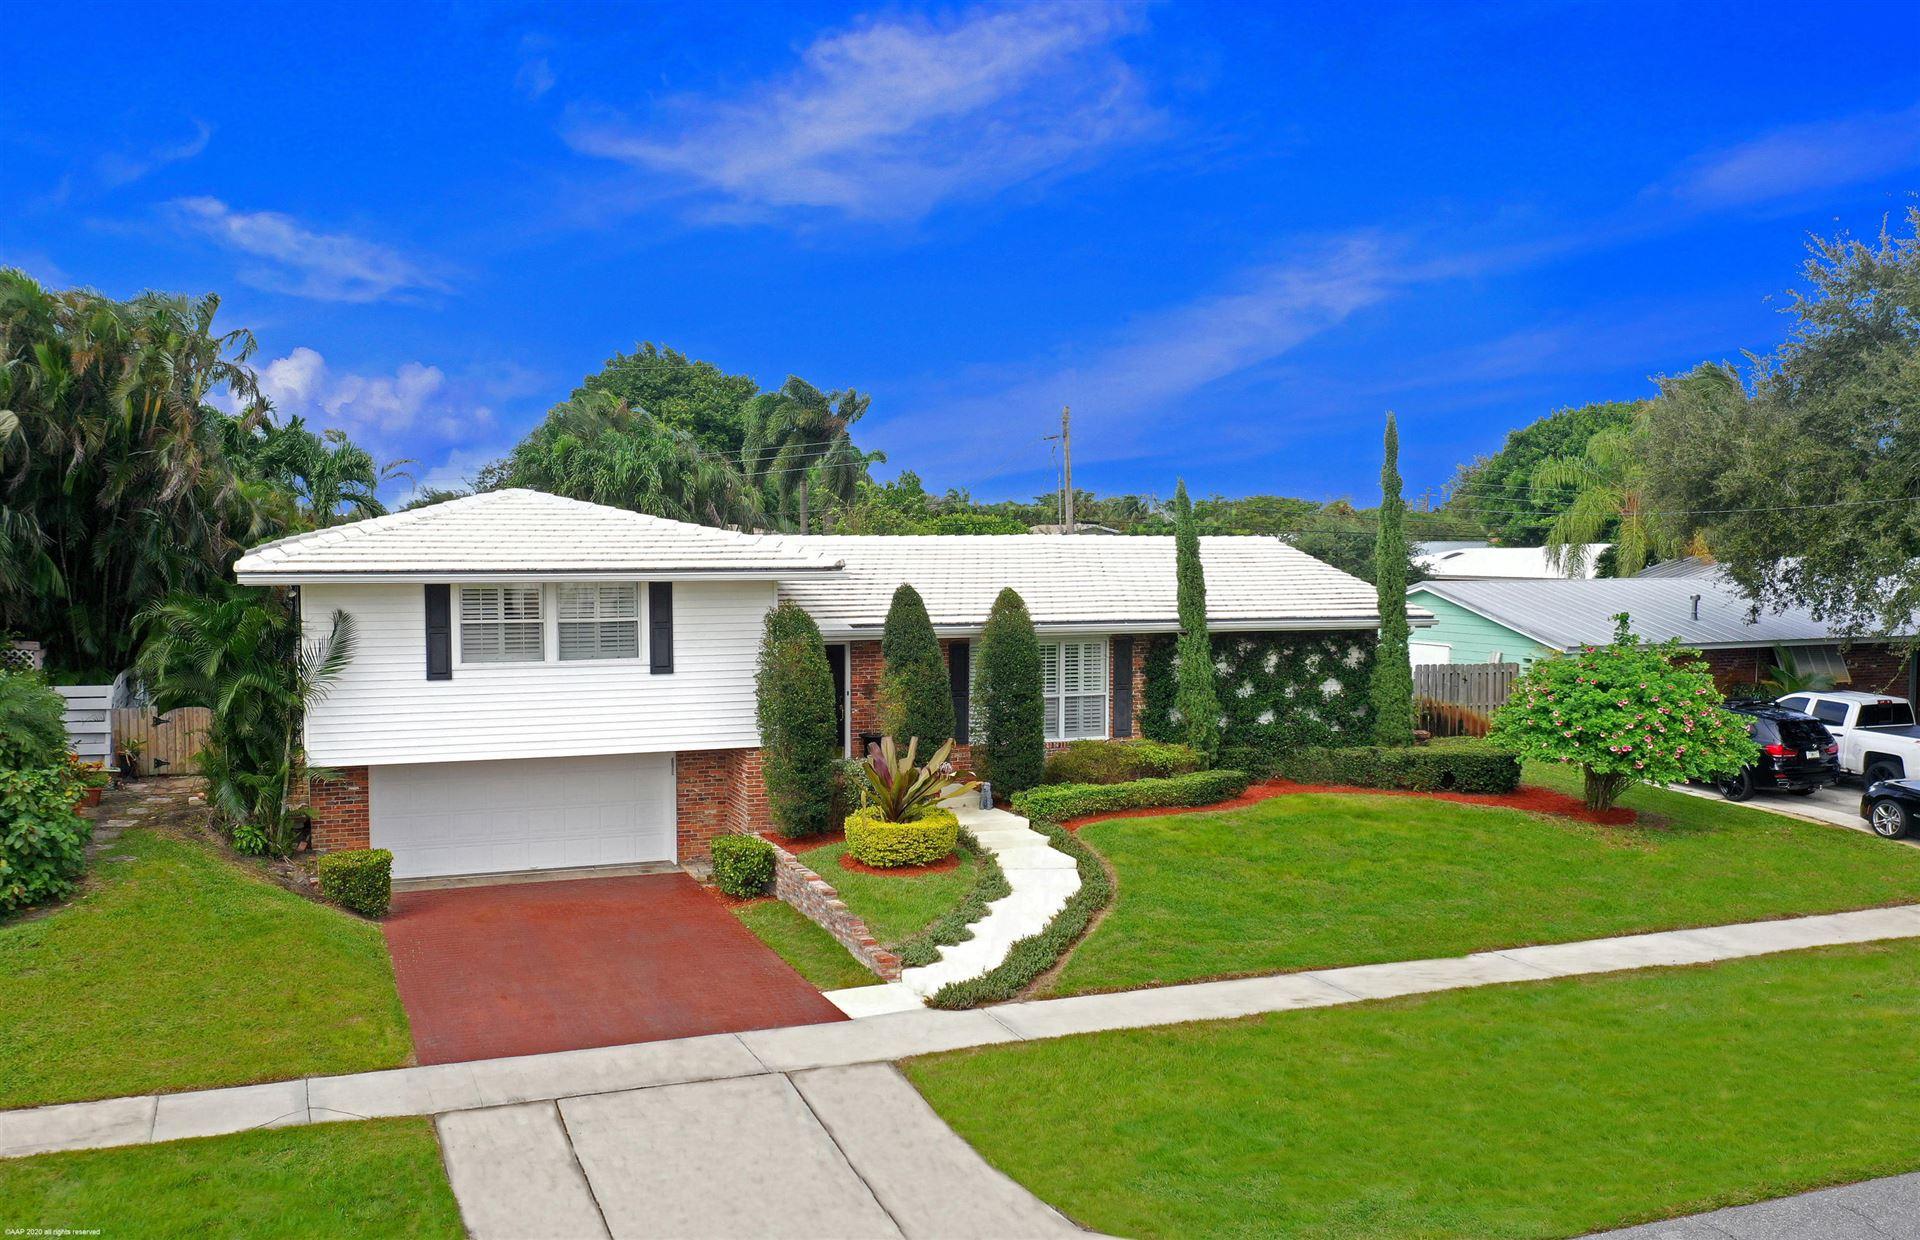 Photo of 513 Anchorage Drive, North Palm Beach, FL 33408 (MLS # RX-10673782)